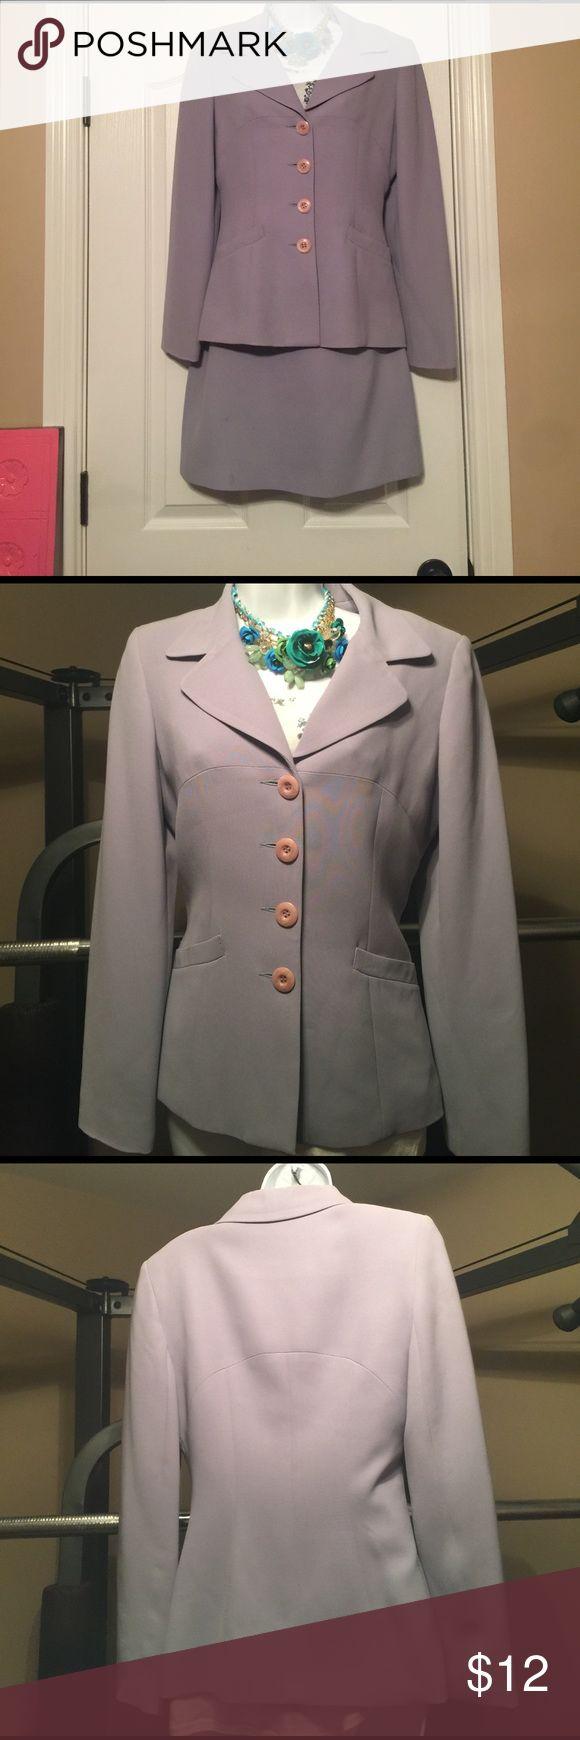 Babe  size 6 blazer  sale 🛍😜size 6 Babe Blazer size 6 in very good condition no stains smoke smoke-free 🎈🎈🎈🛍🛍 bebe Jackets & Coats Blazers